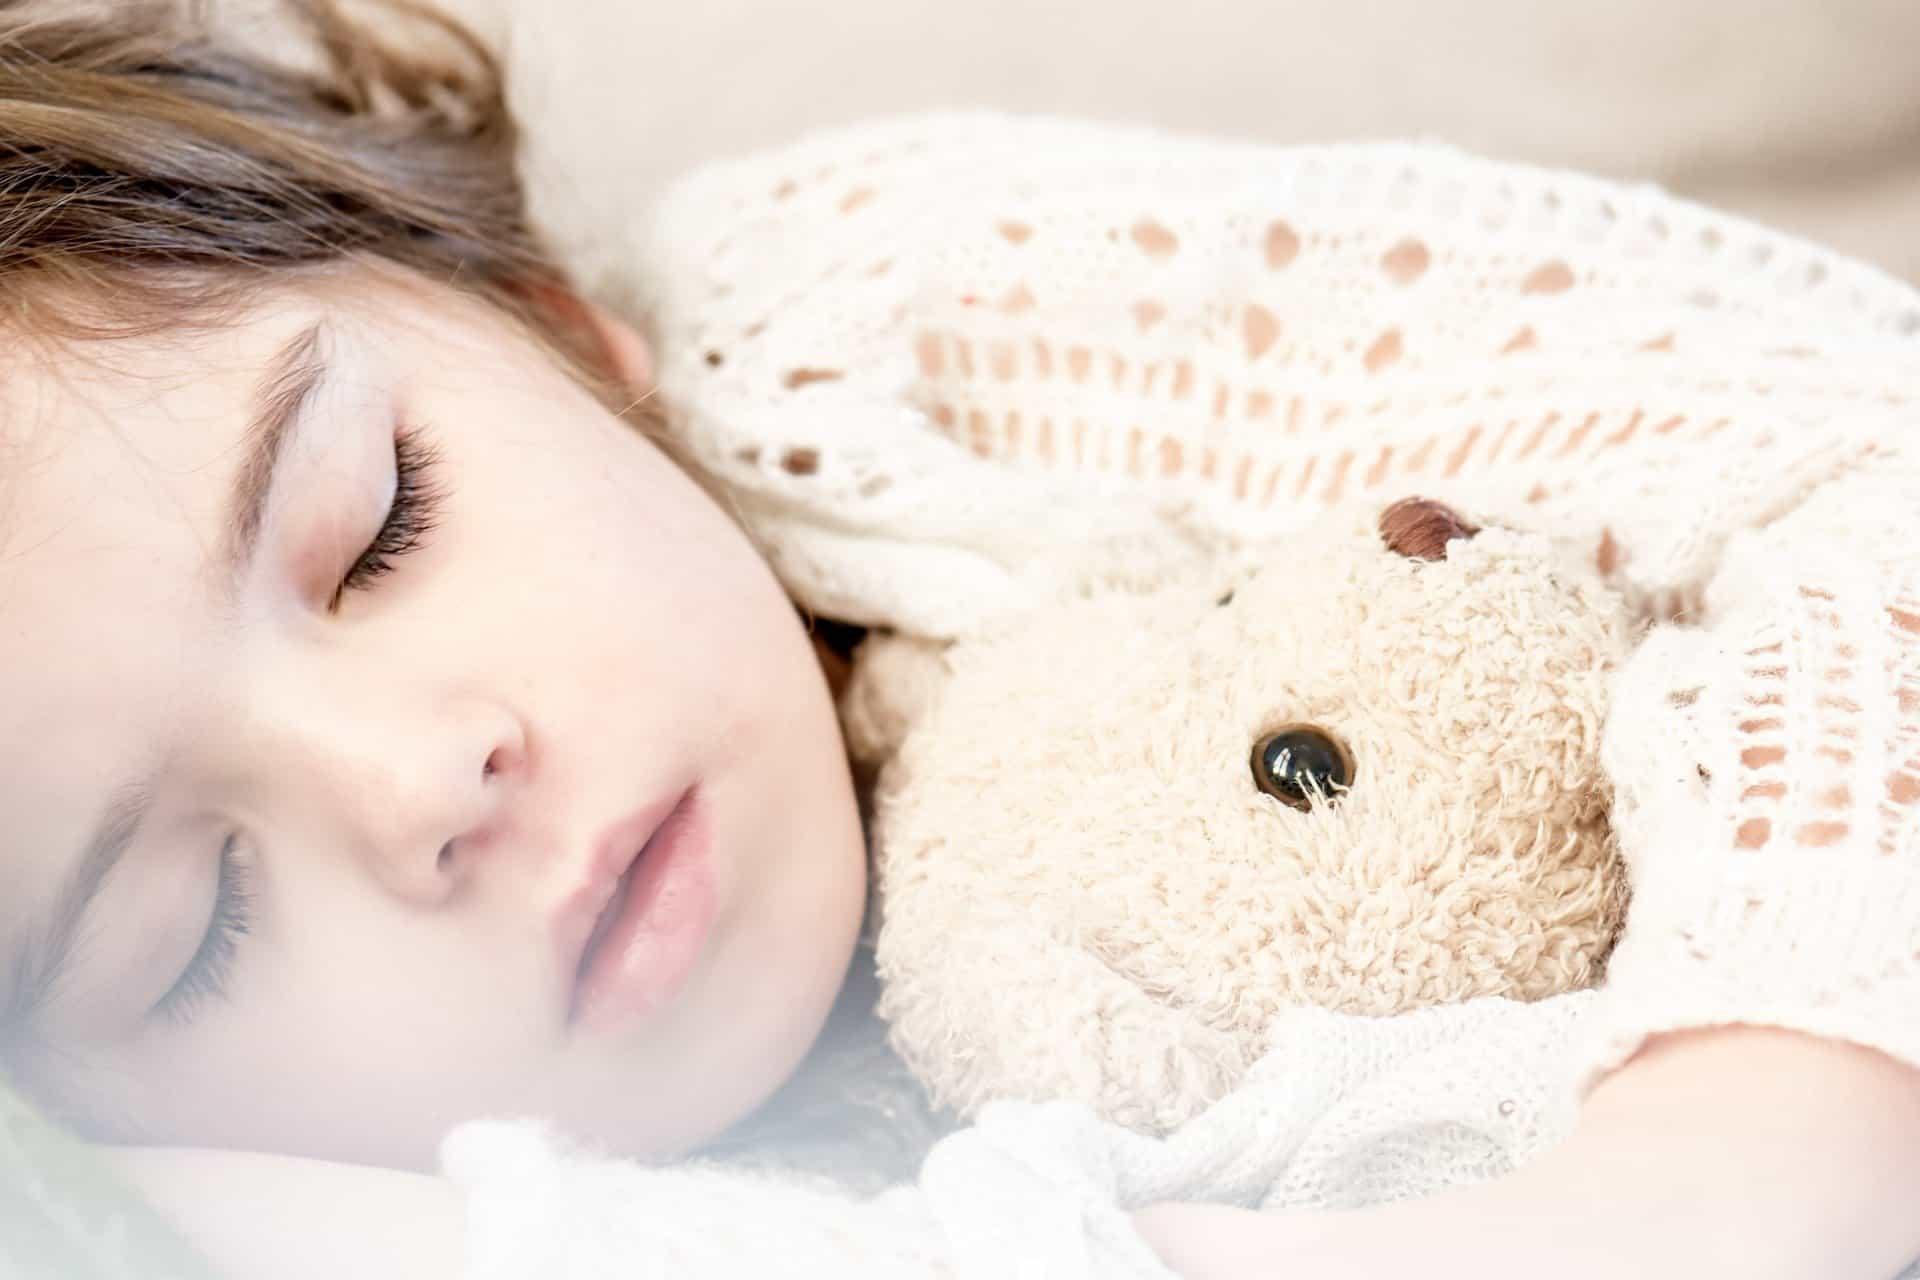 child sleeping nap time